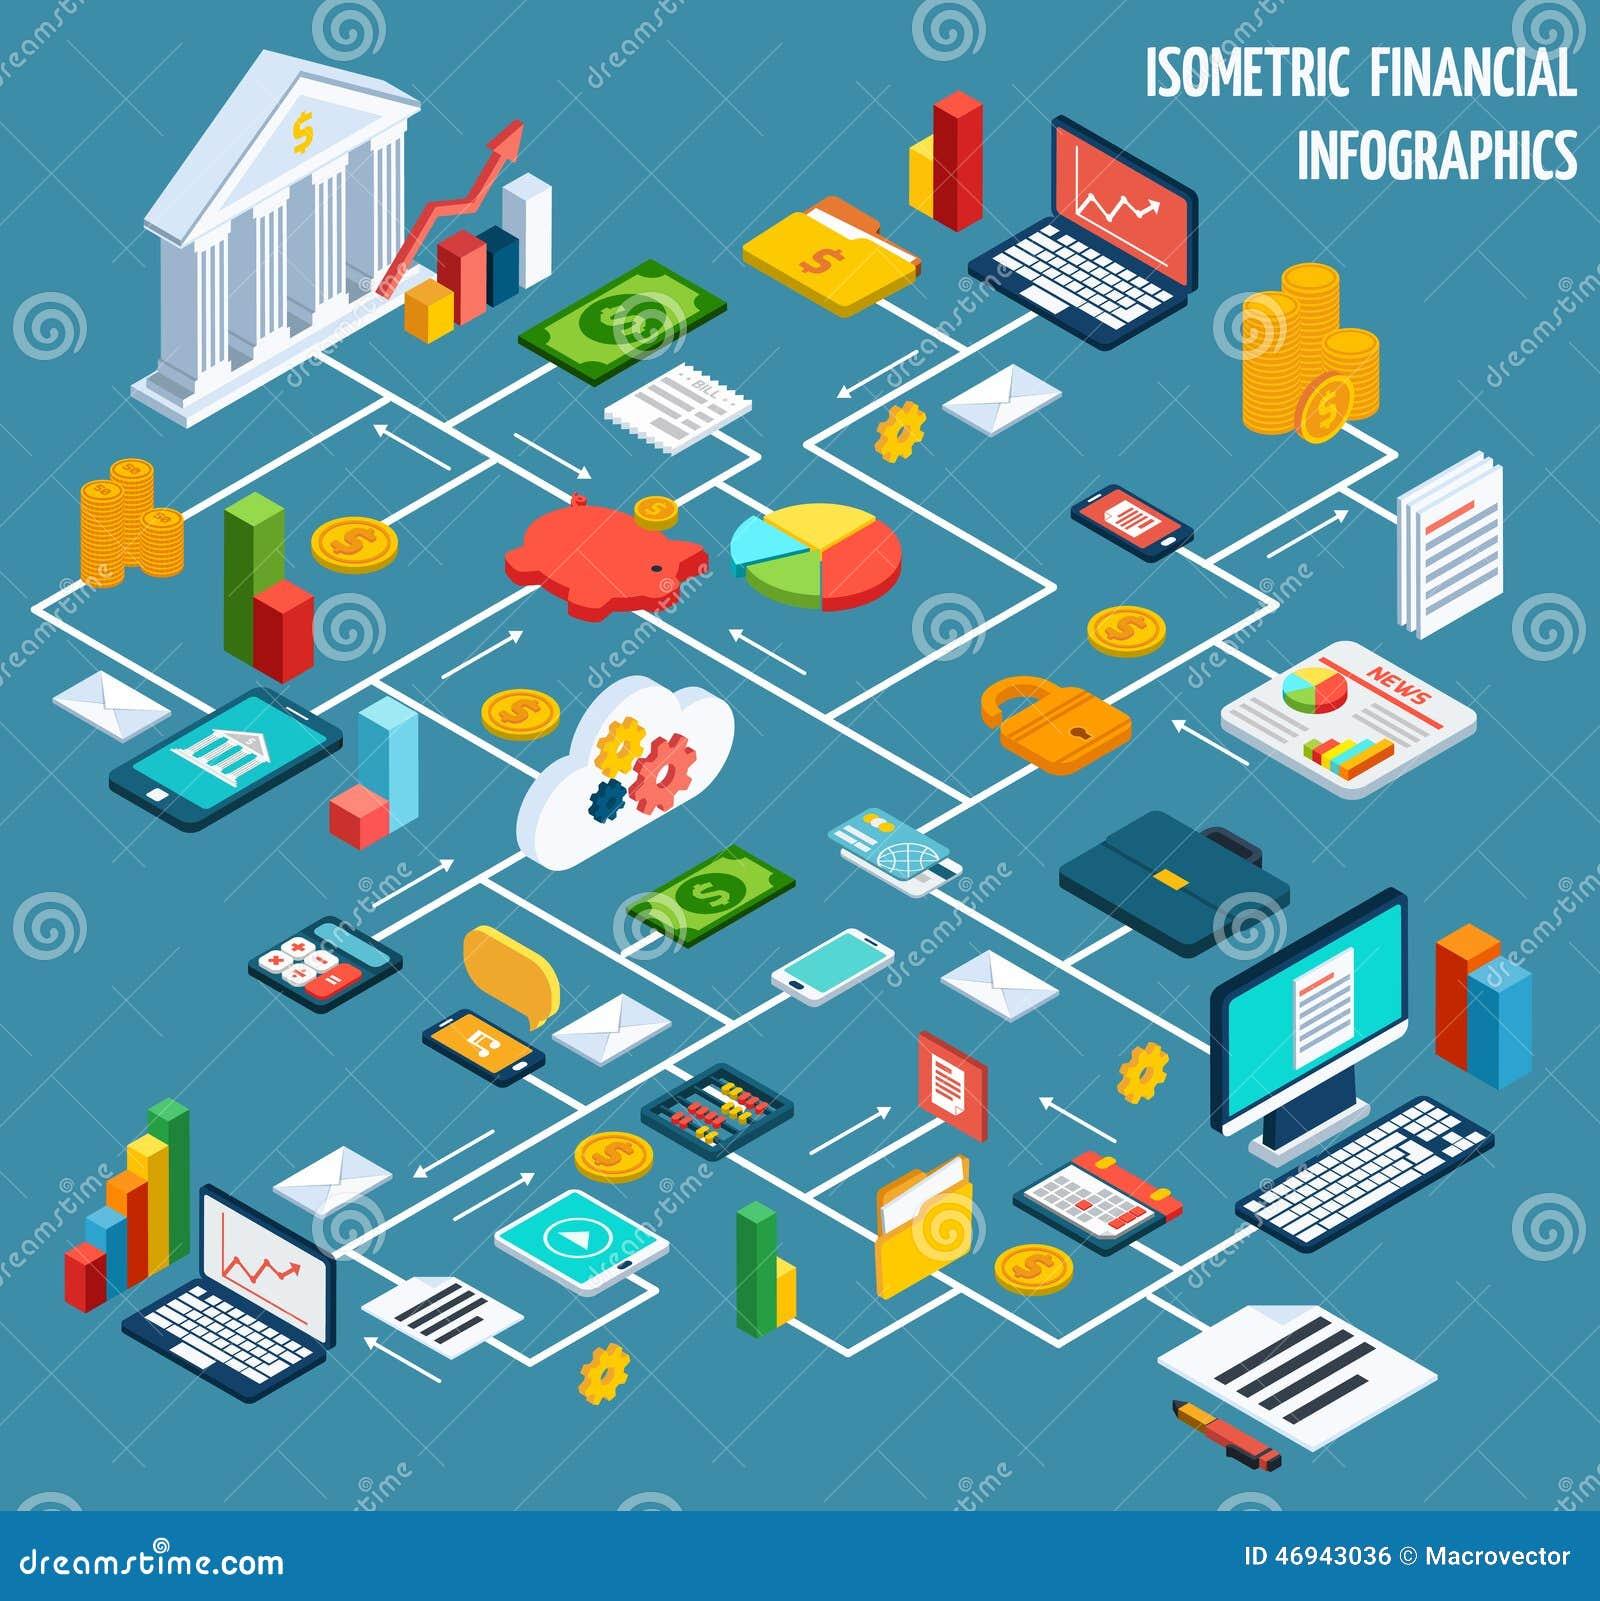 Isometric financial flowchart